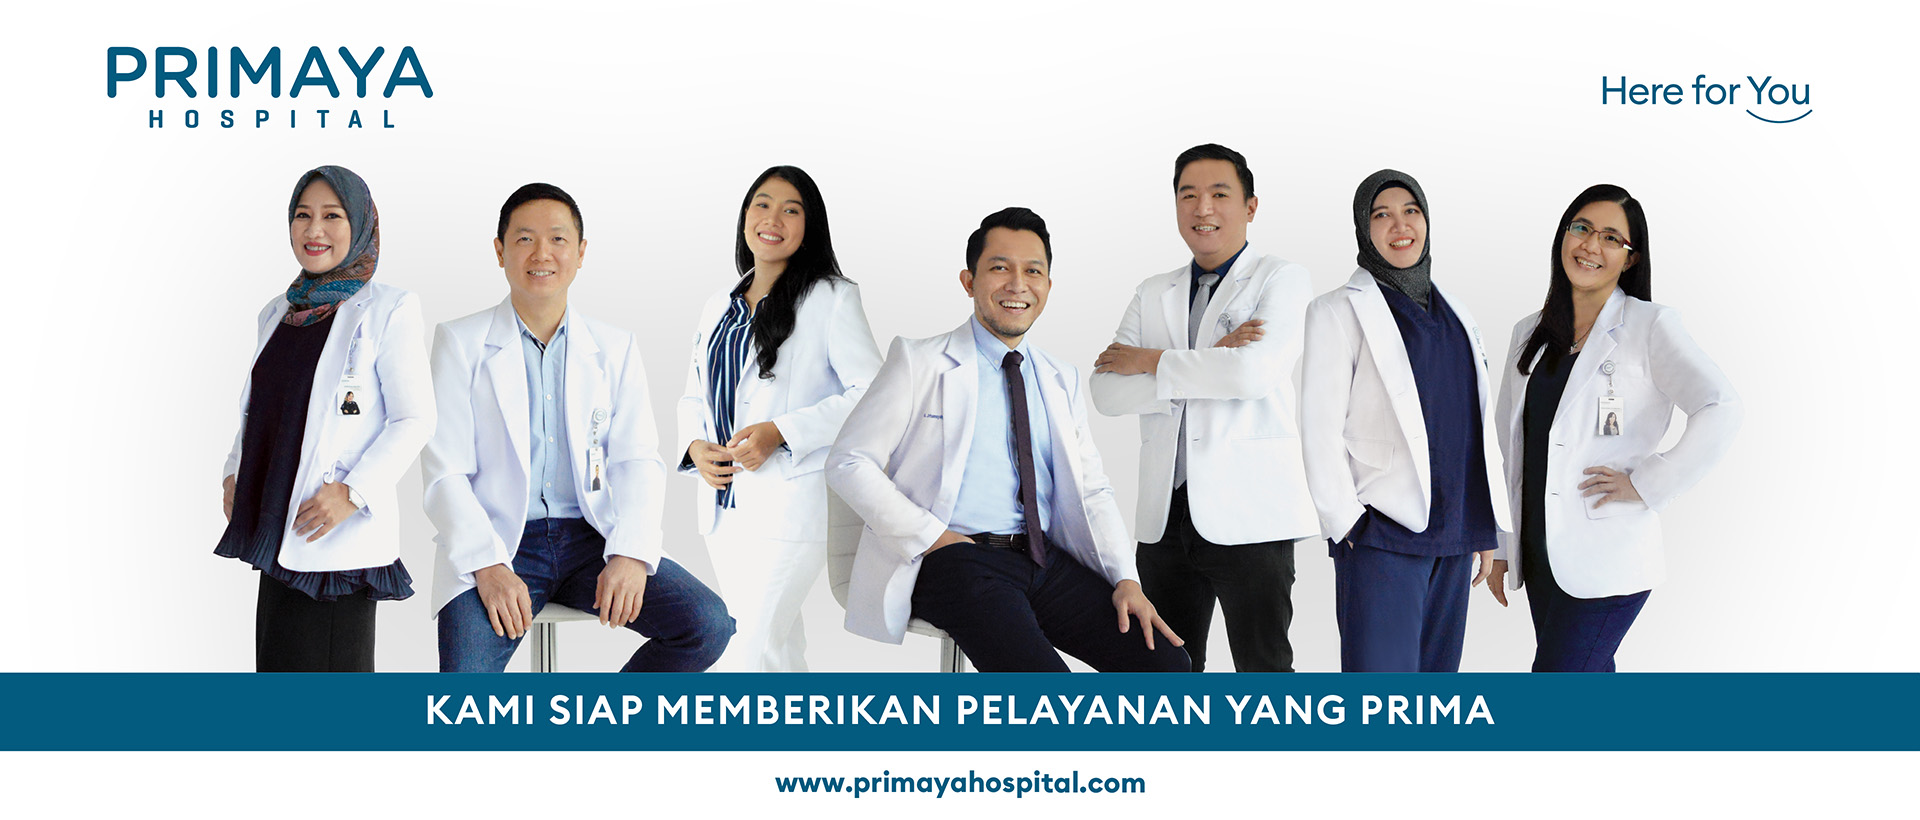 Web Banner Doctors Primaya Hospital